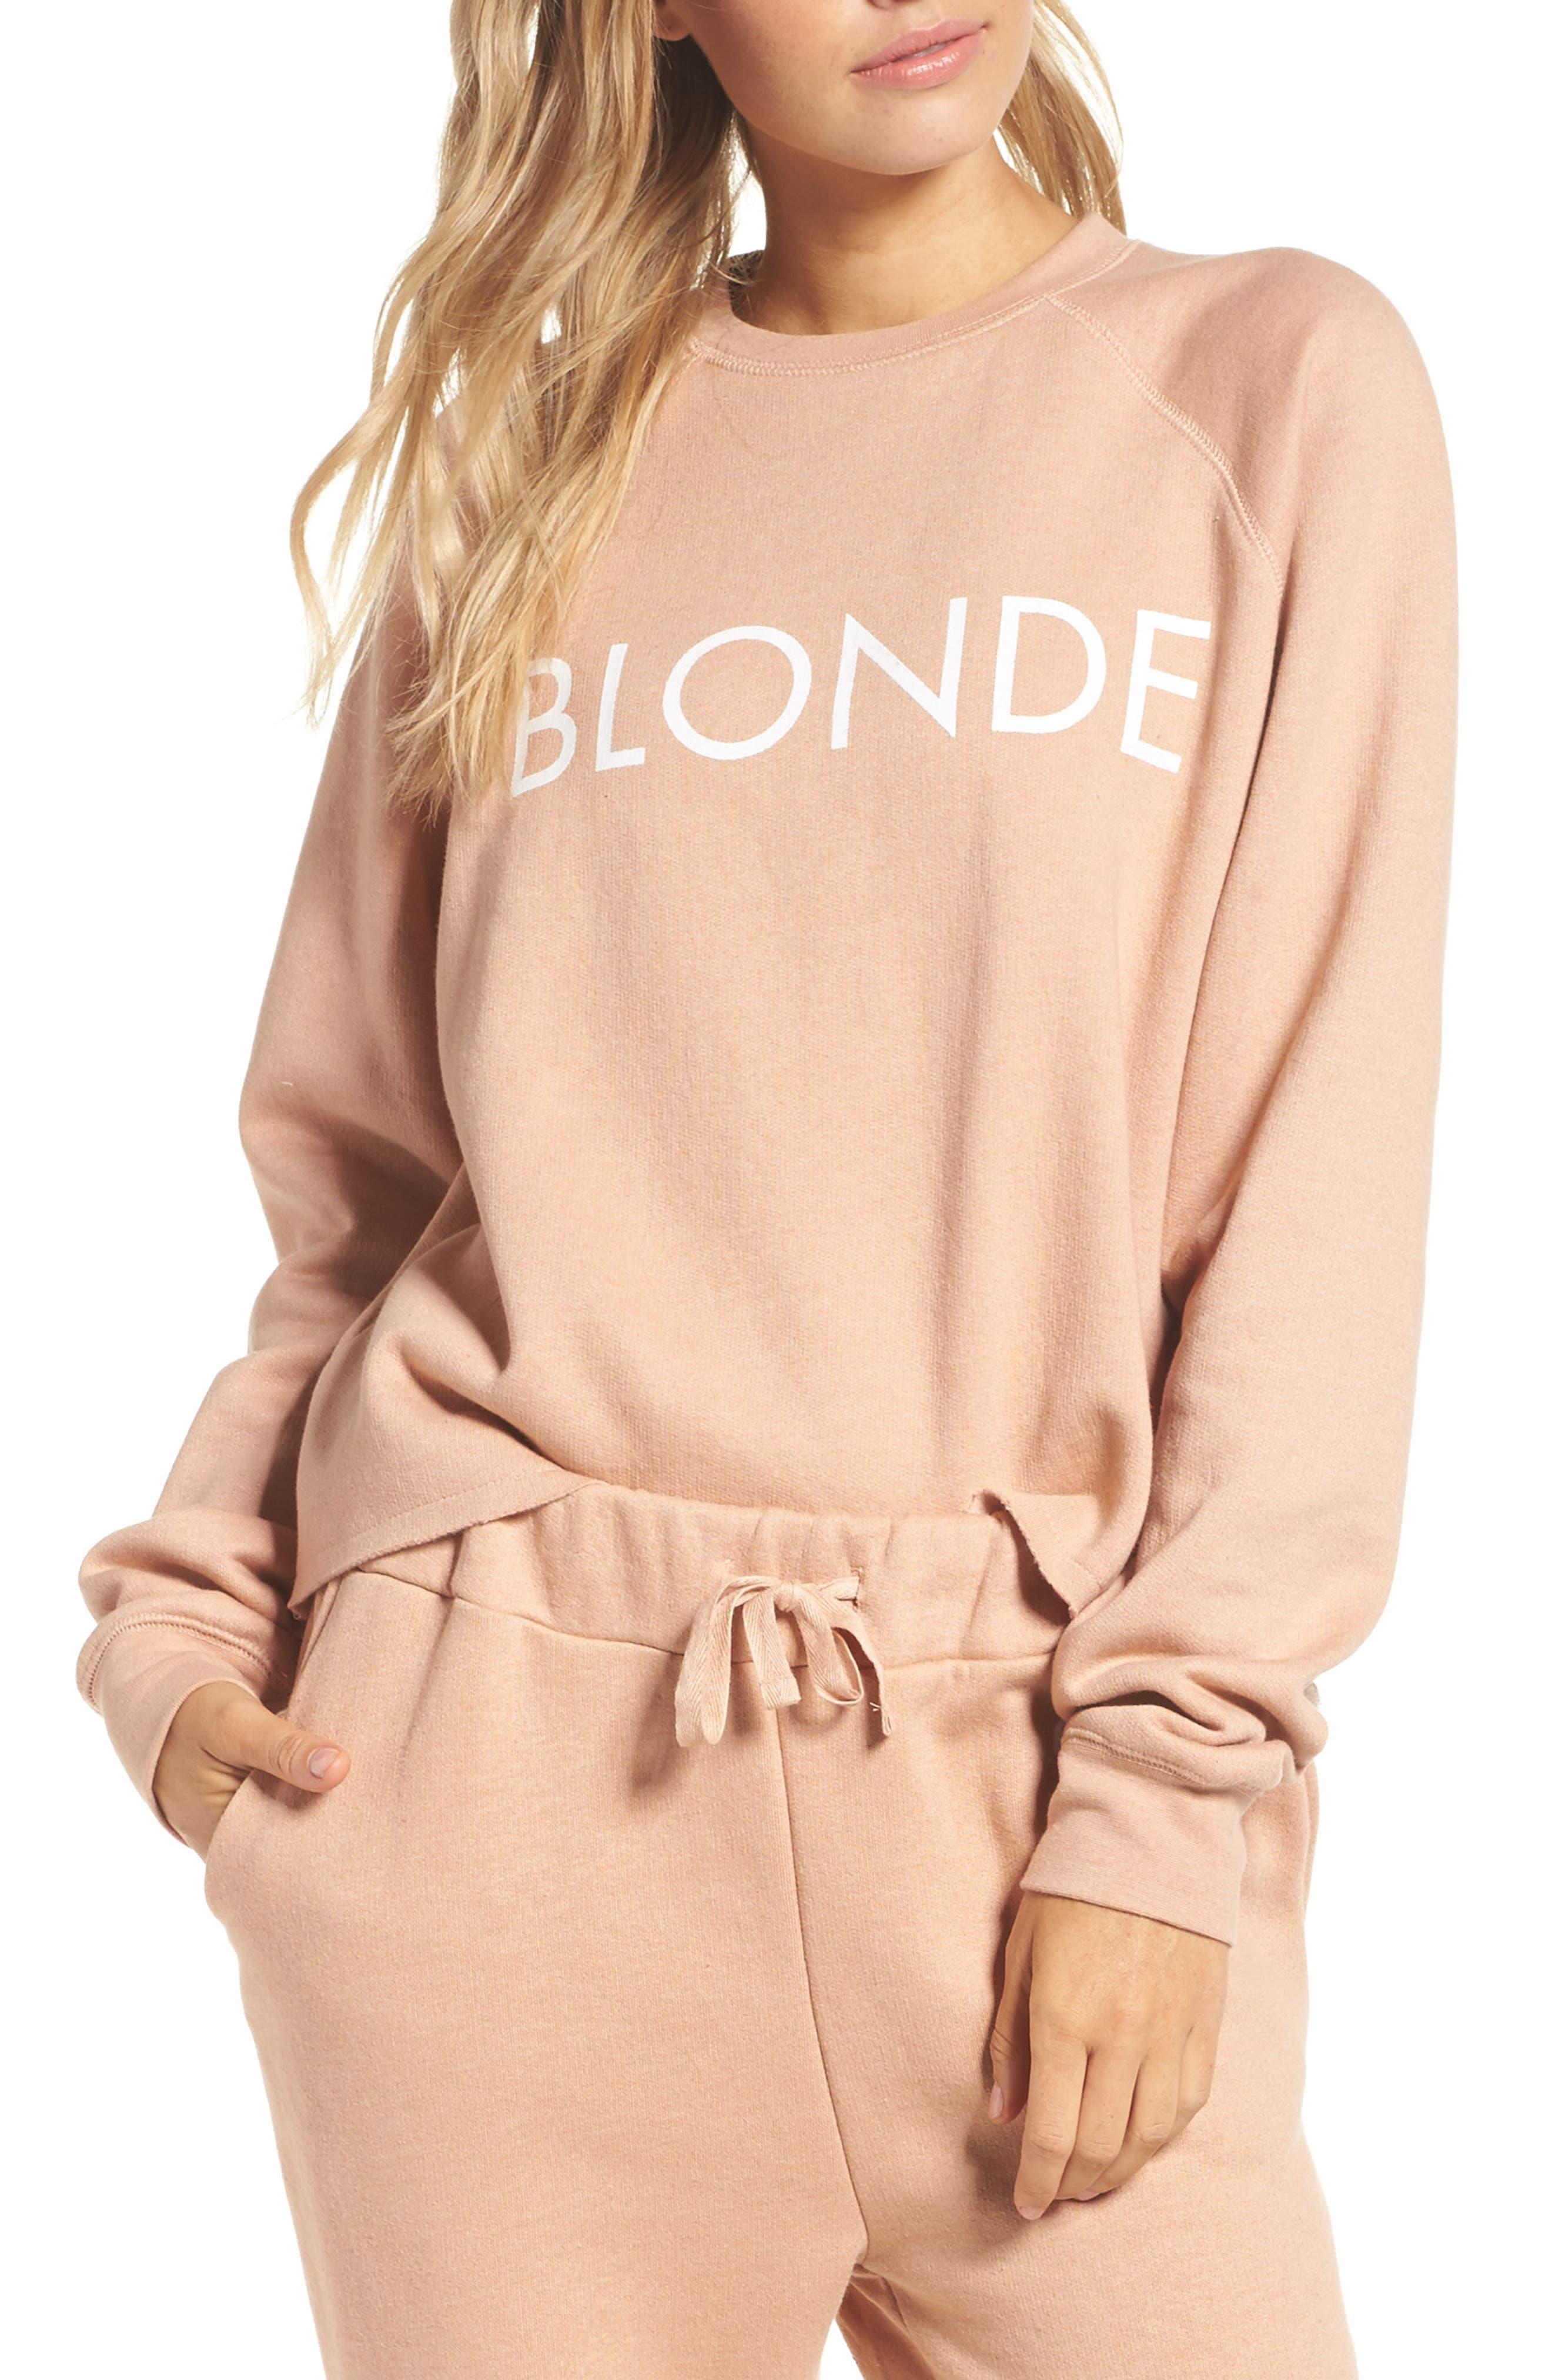 Middle Sister Blonde Sweatshirt,                             Main thumbnail 1, color,                             Beige